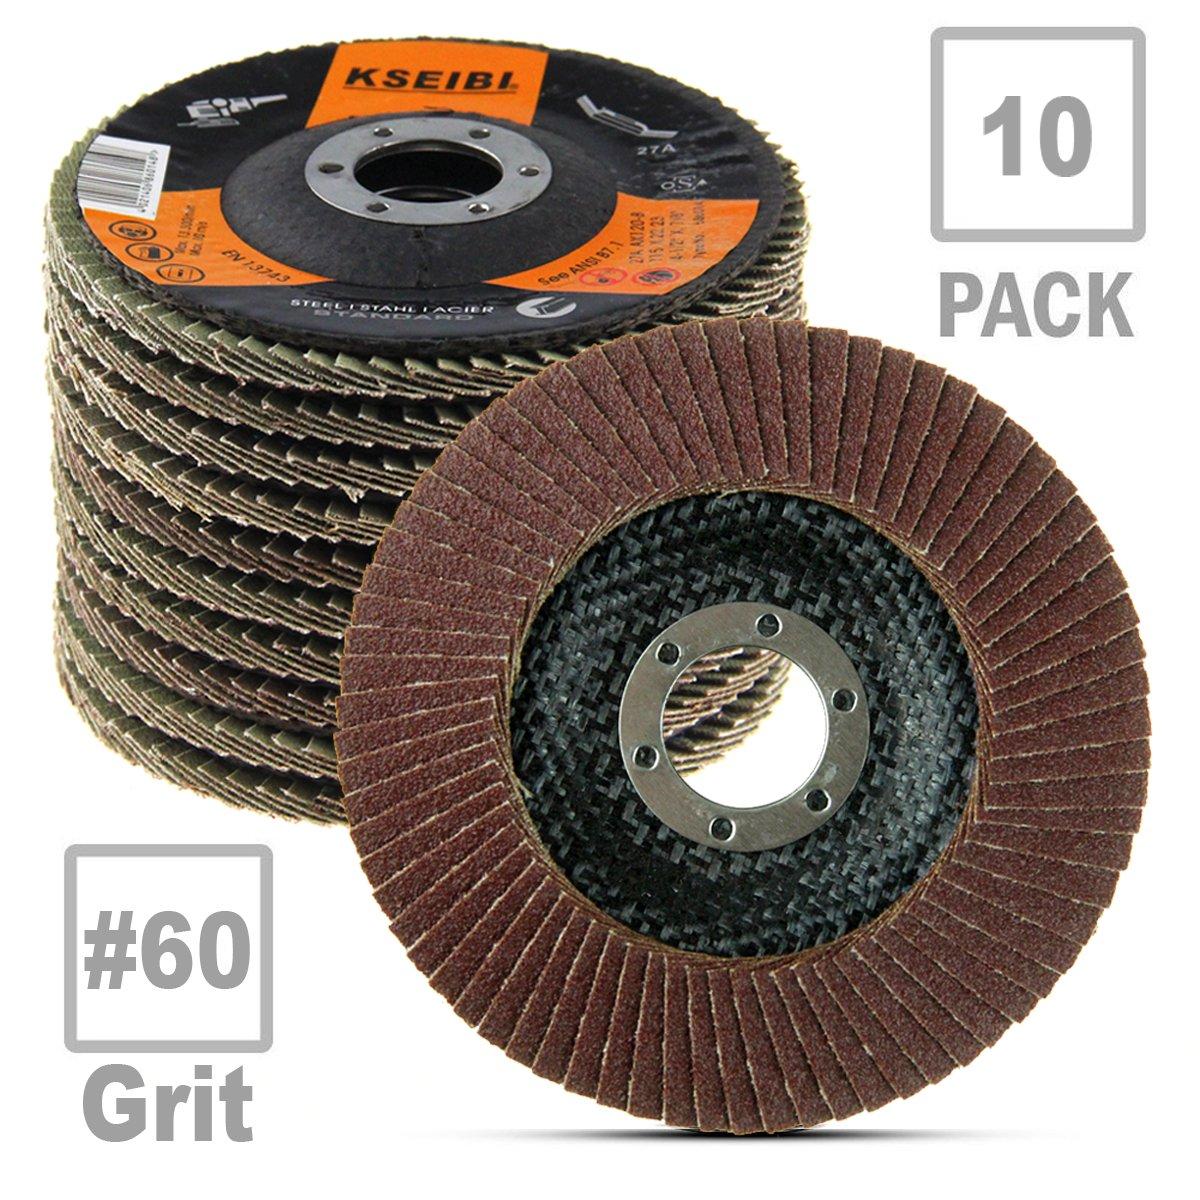 KSEIBI Aluminum Oxide 4 1/2 Inch Auto Body Flap Disc Sanding Grinding Wheel 10 Pack (60 Grit)